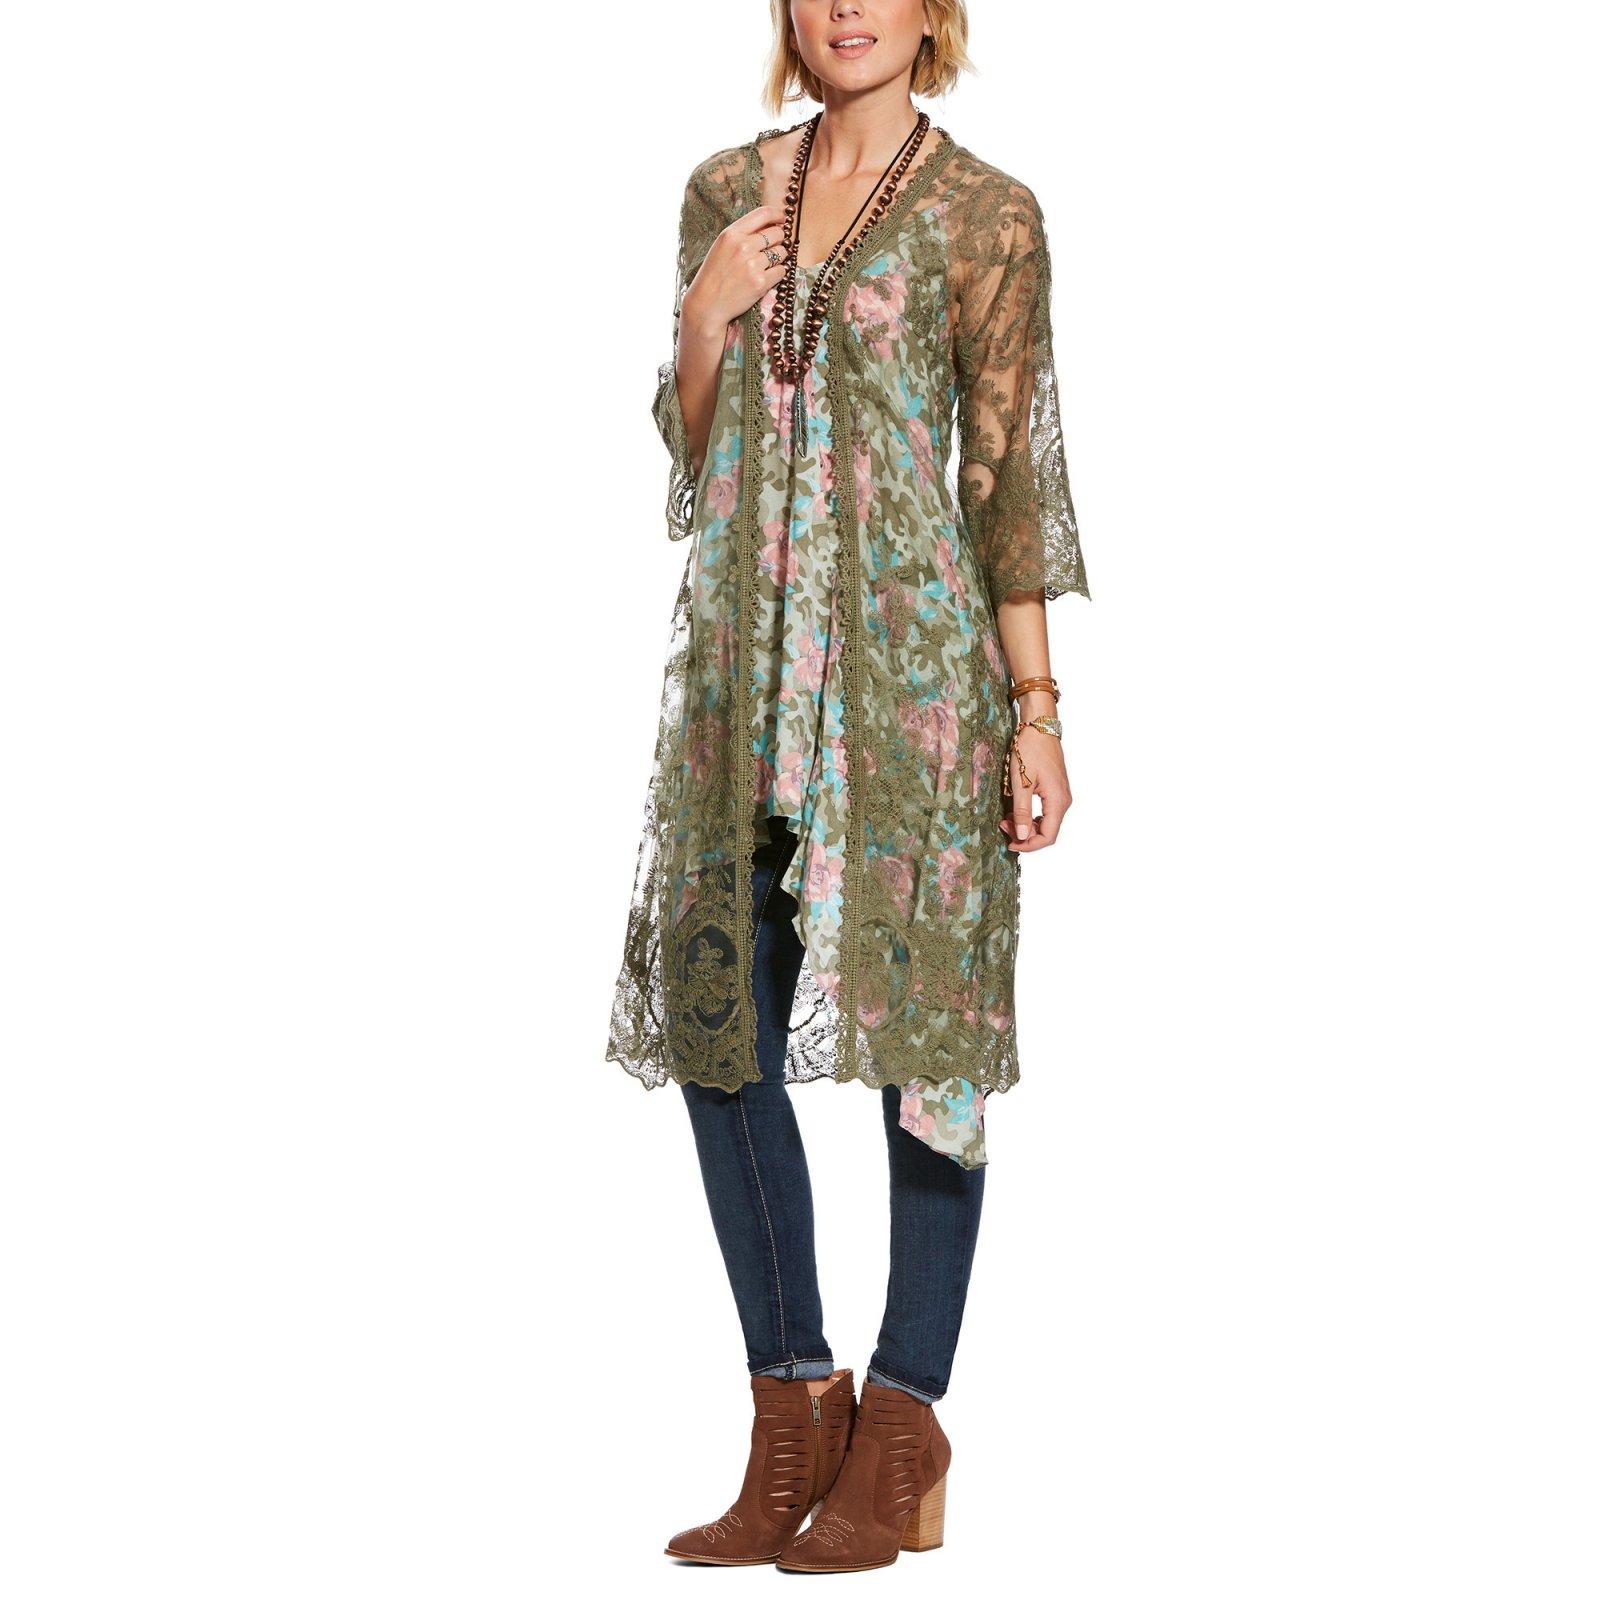 Clover Kimono from Ariat